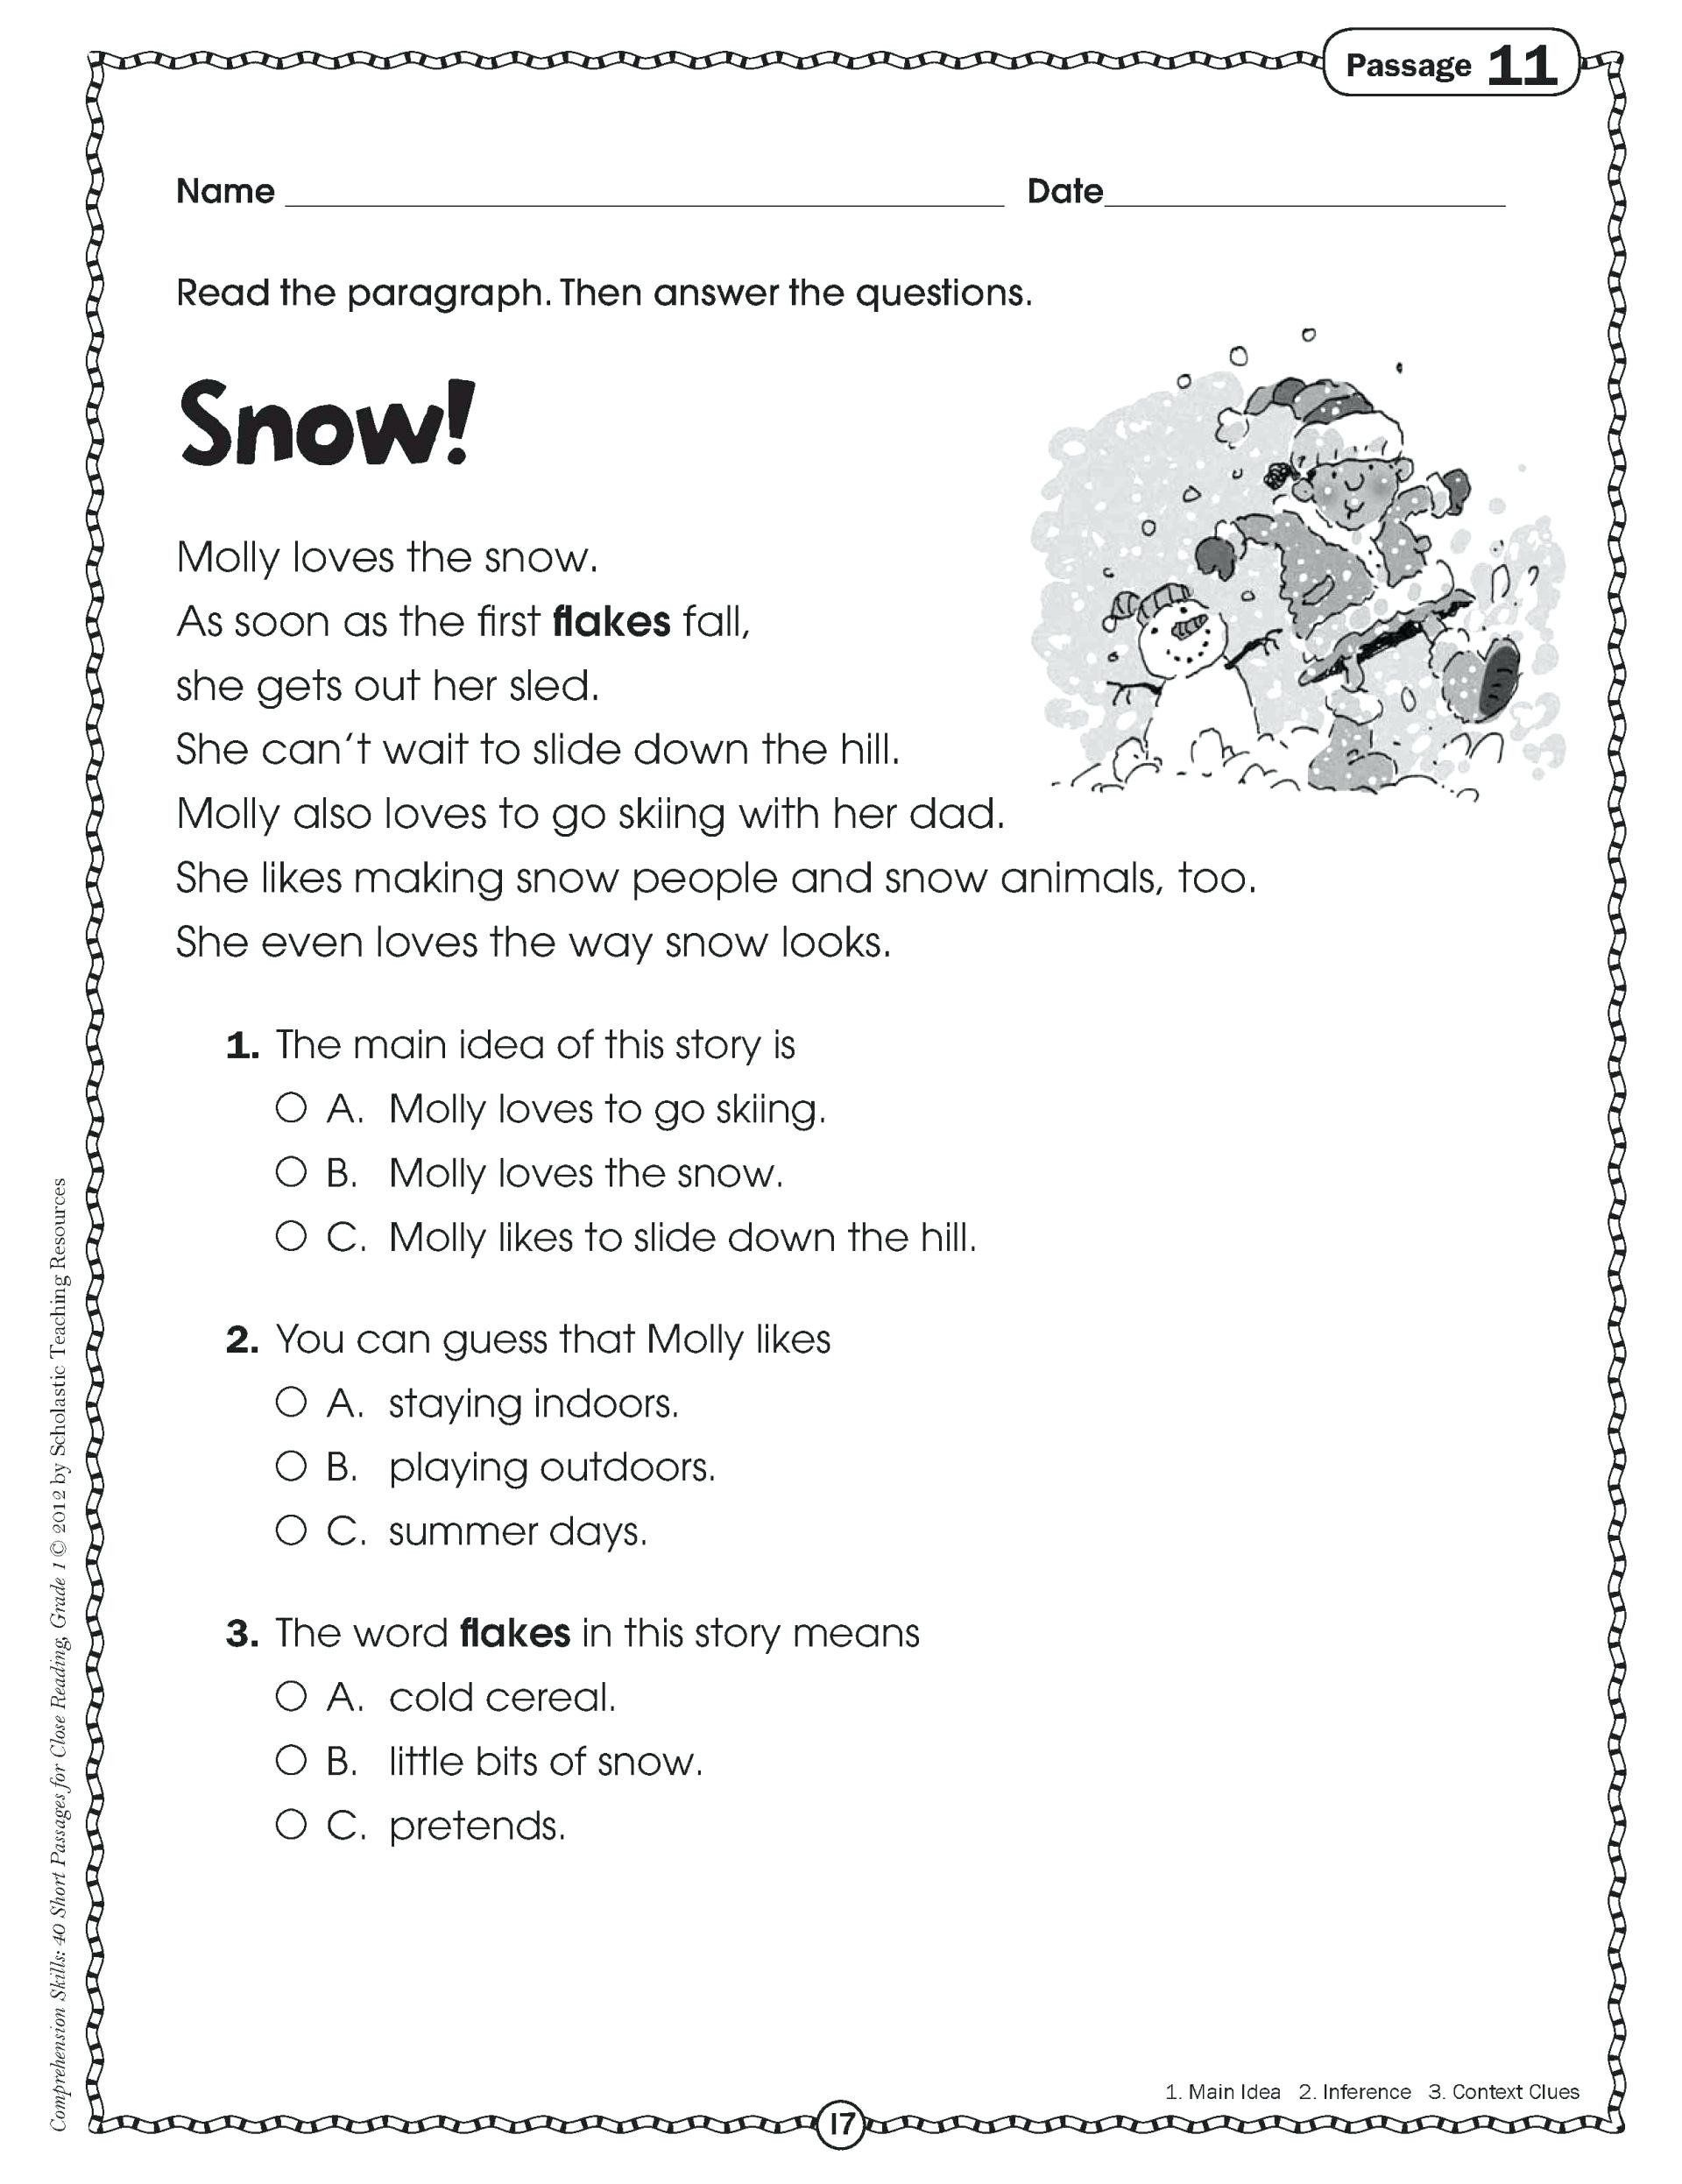 Close Reading 6th Grade 5 Preschool Worksheets Free Printables Reading  Prehension   Main idea worksheet [ 2493 x 1920 Pixel ]